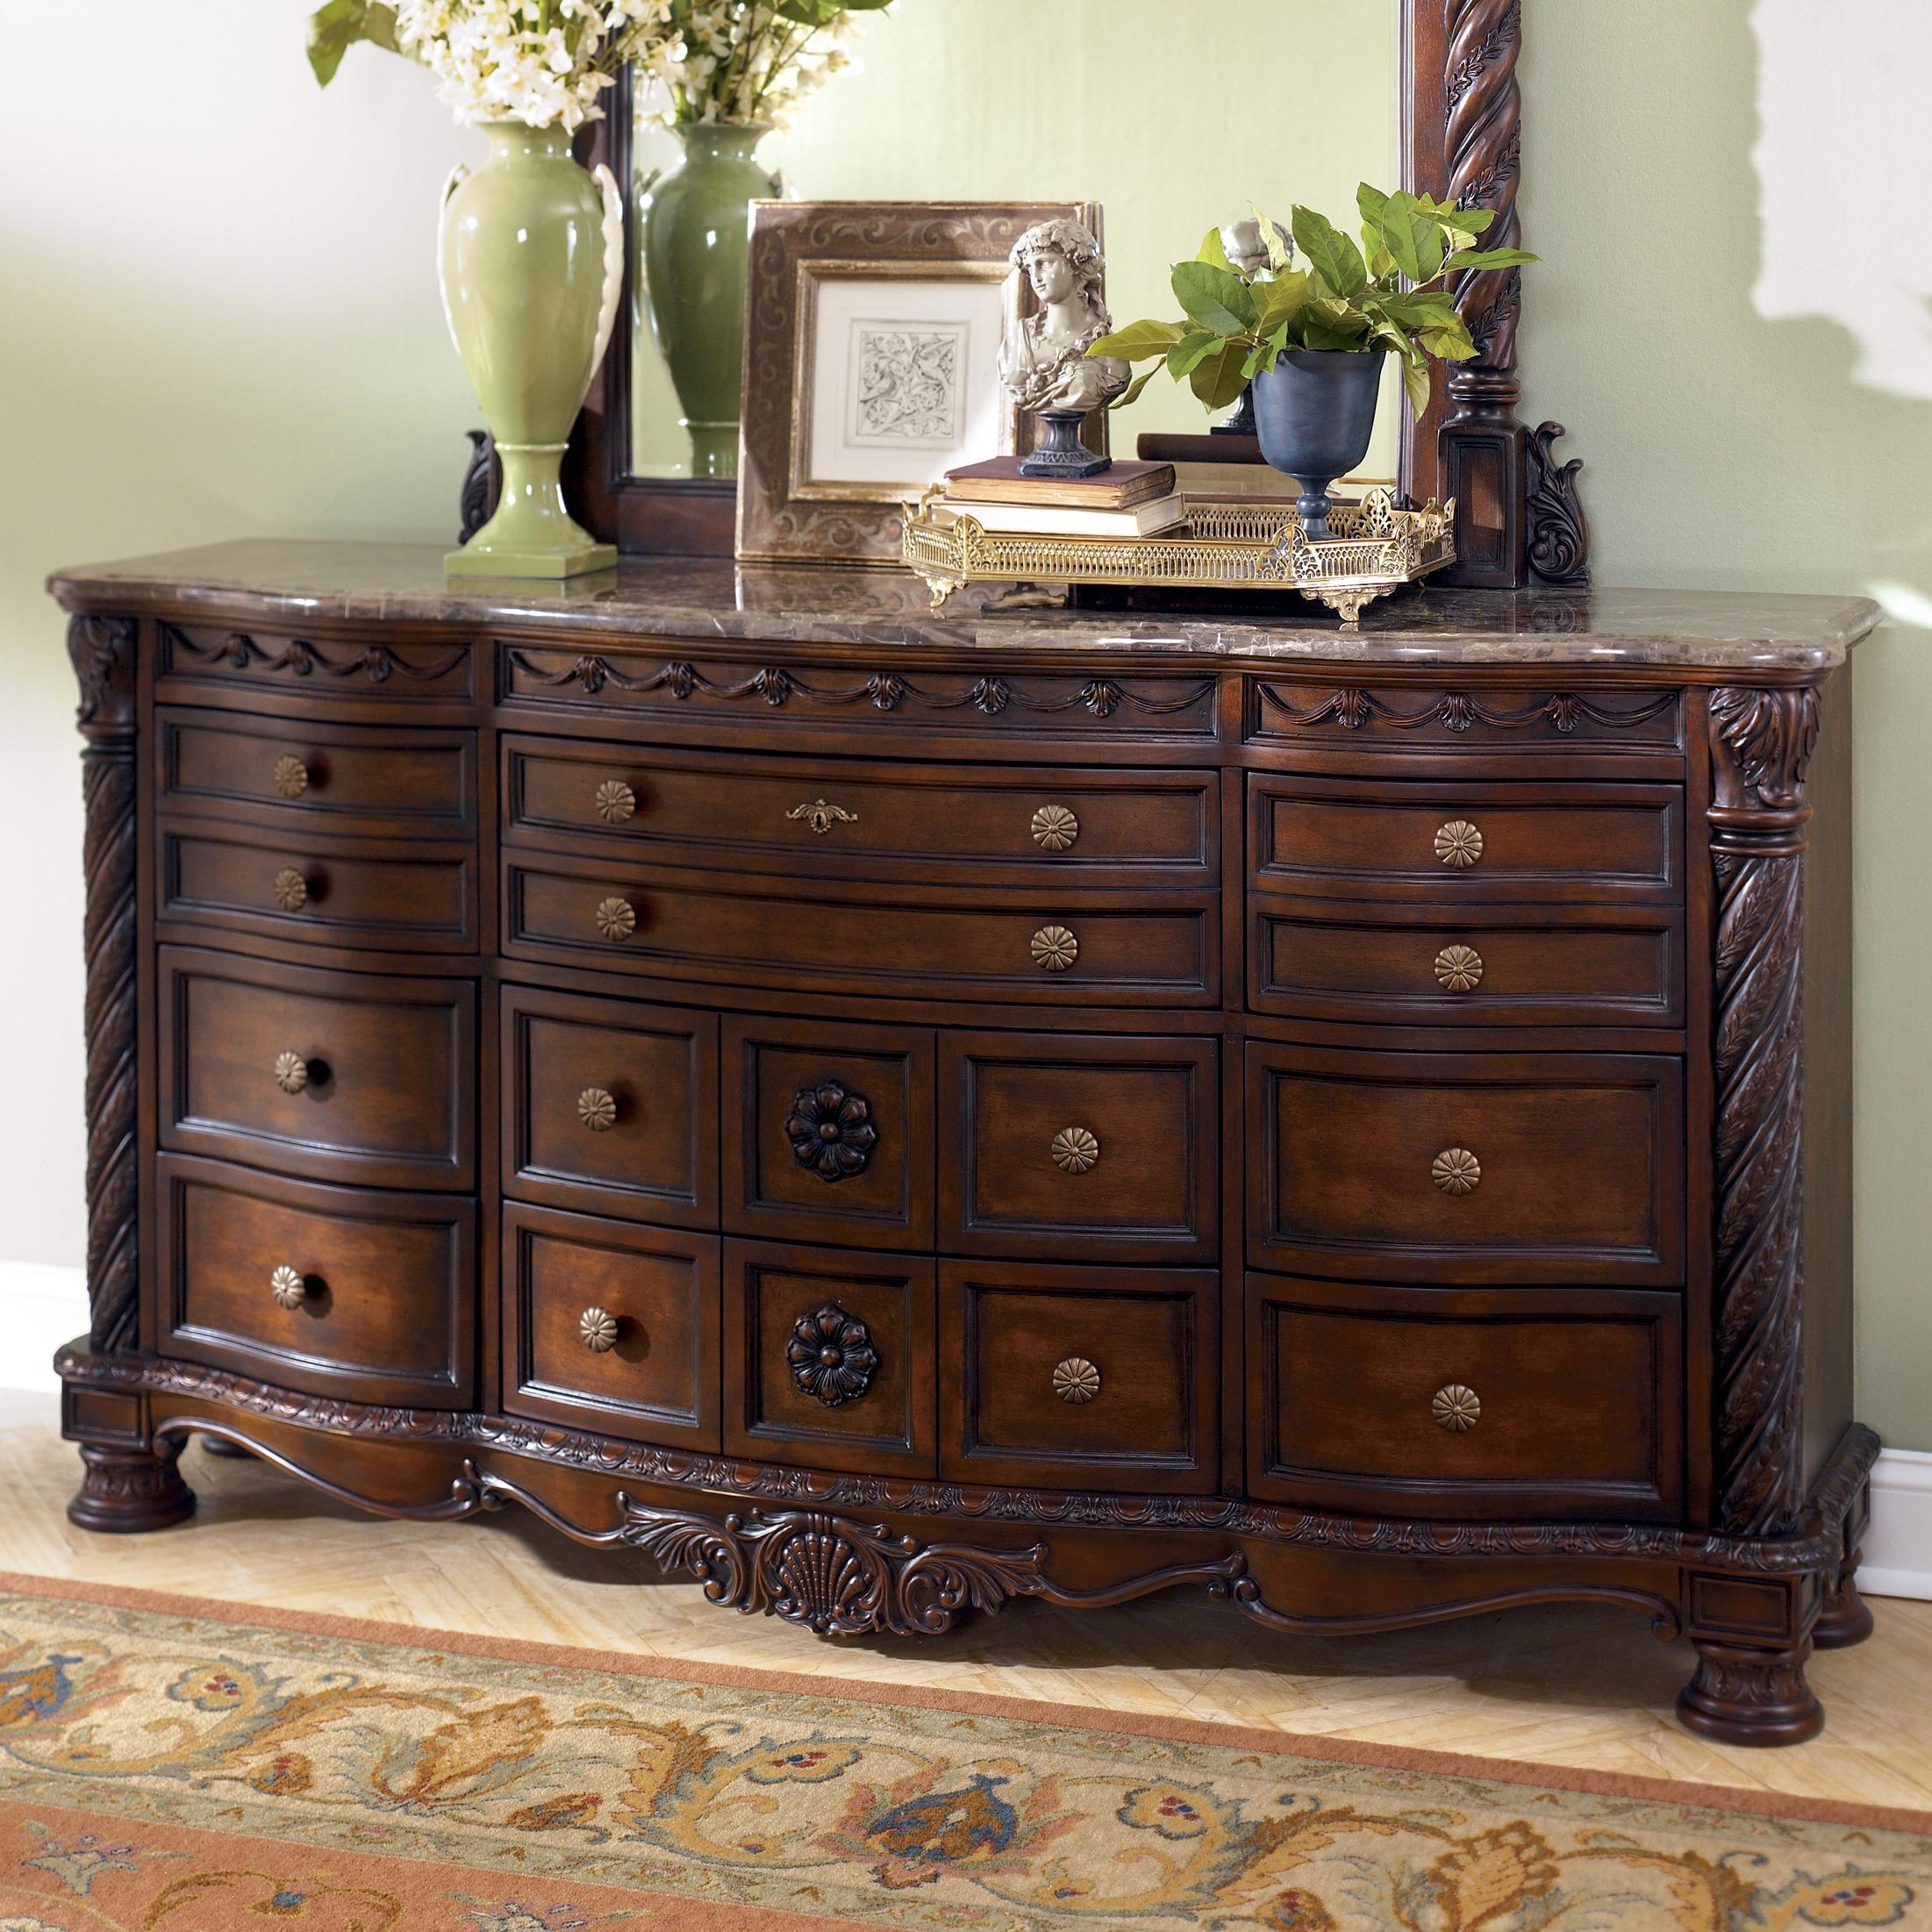 Old World Stone Top Dresser